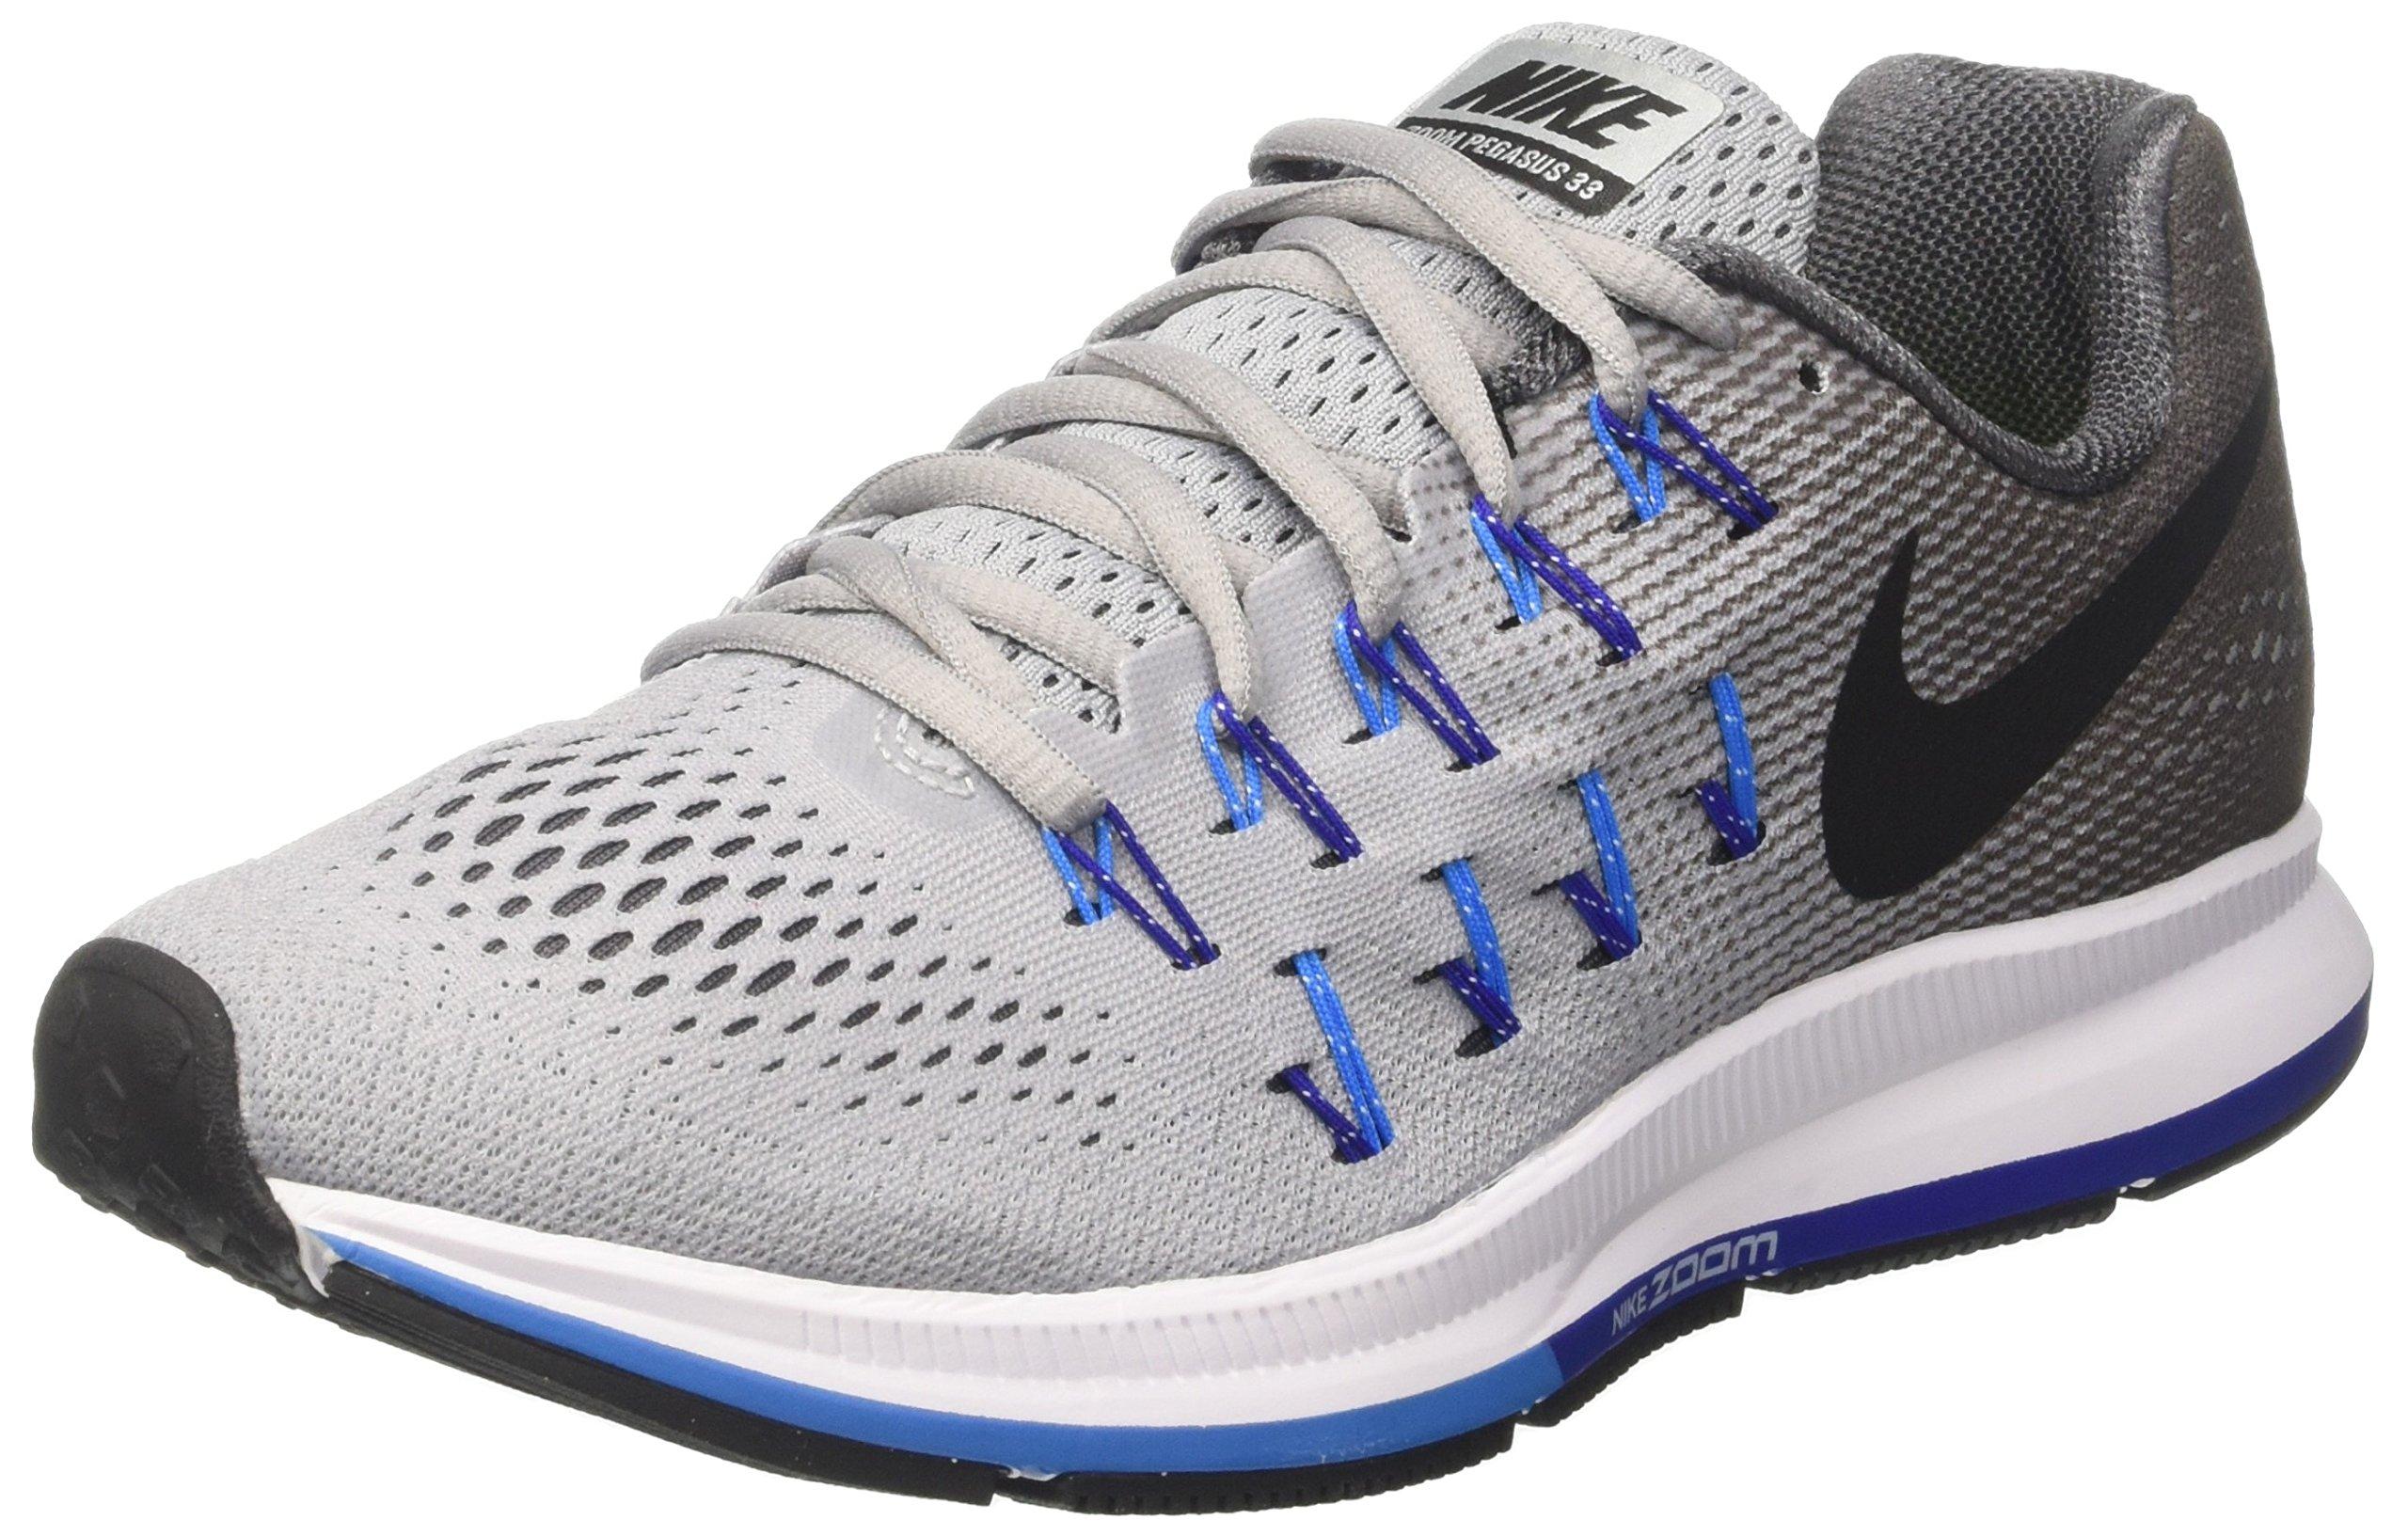 3c2205e2dc0 Galleon - Nike Men s Air Zoom Pegasus 33 Wolf Grey Black Dark Grey Running  Shoe 13 Men US